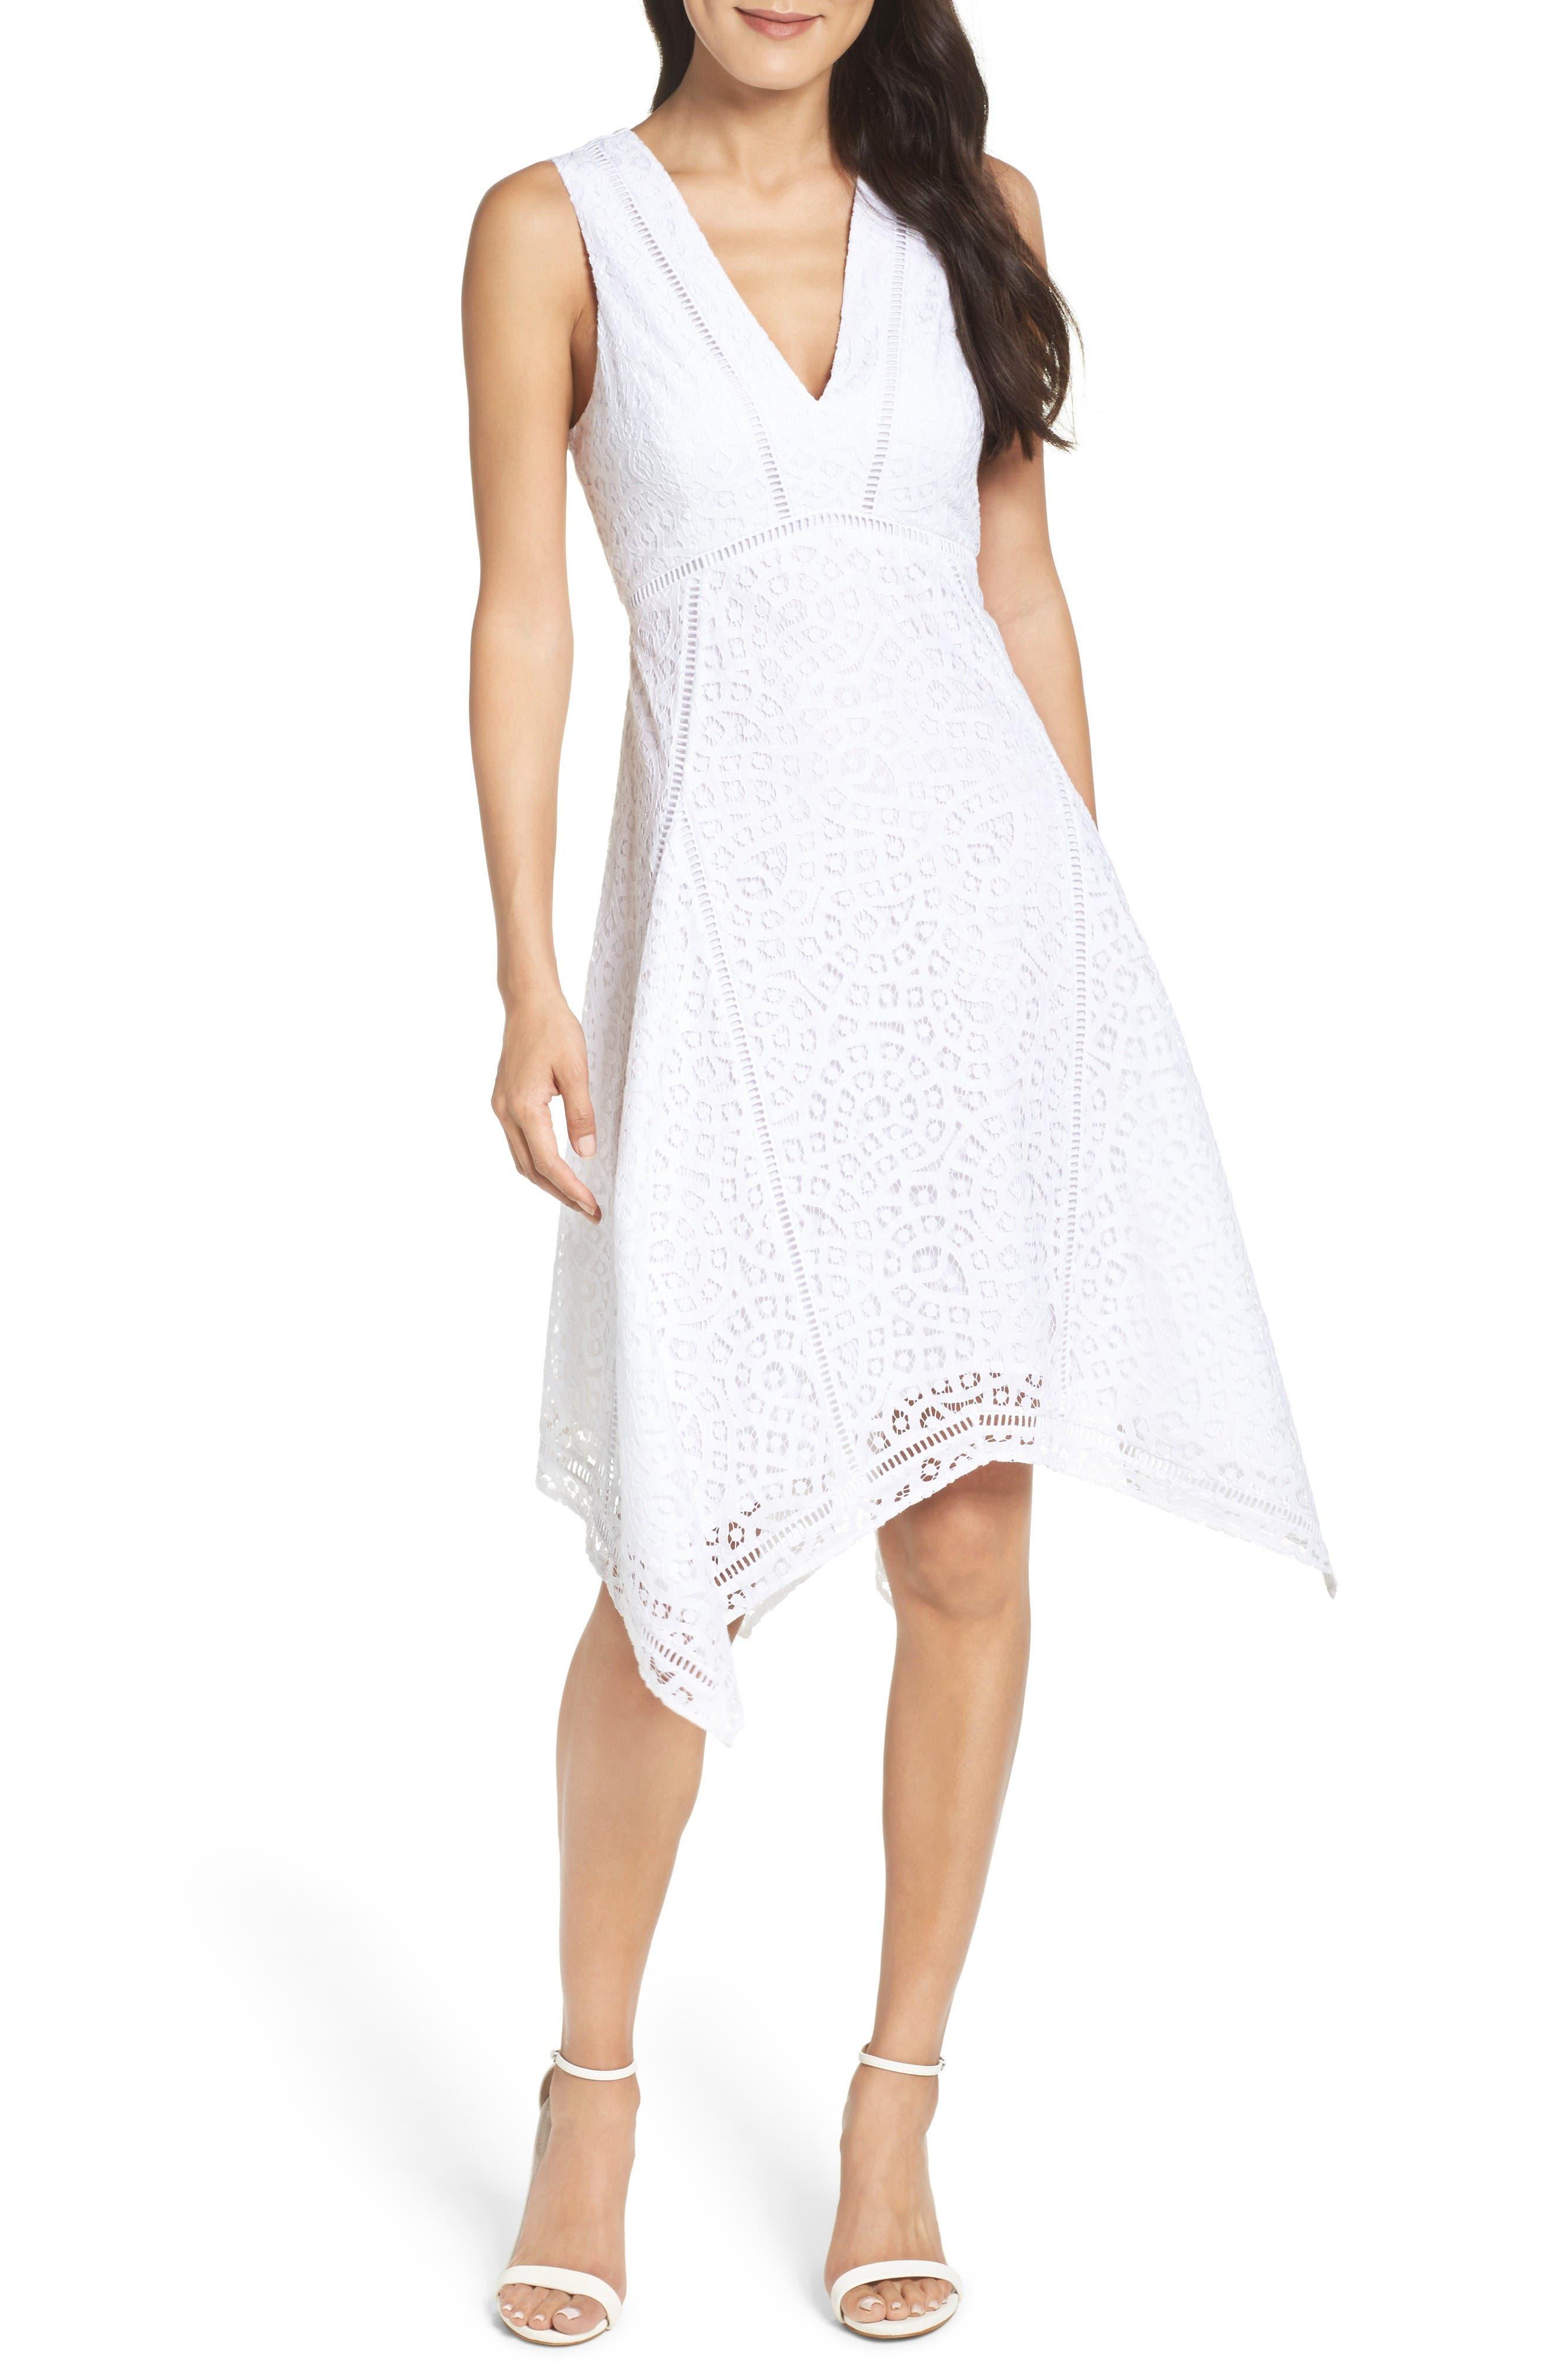 Main Image - Lilly Pulitzer® Elyse Dress